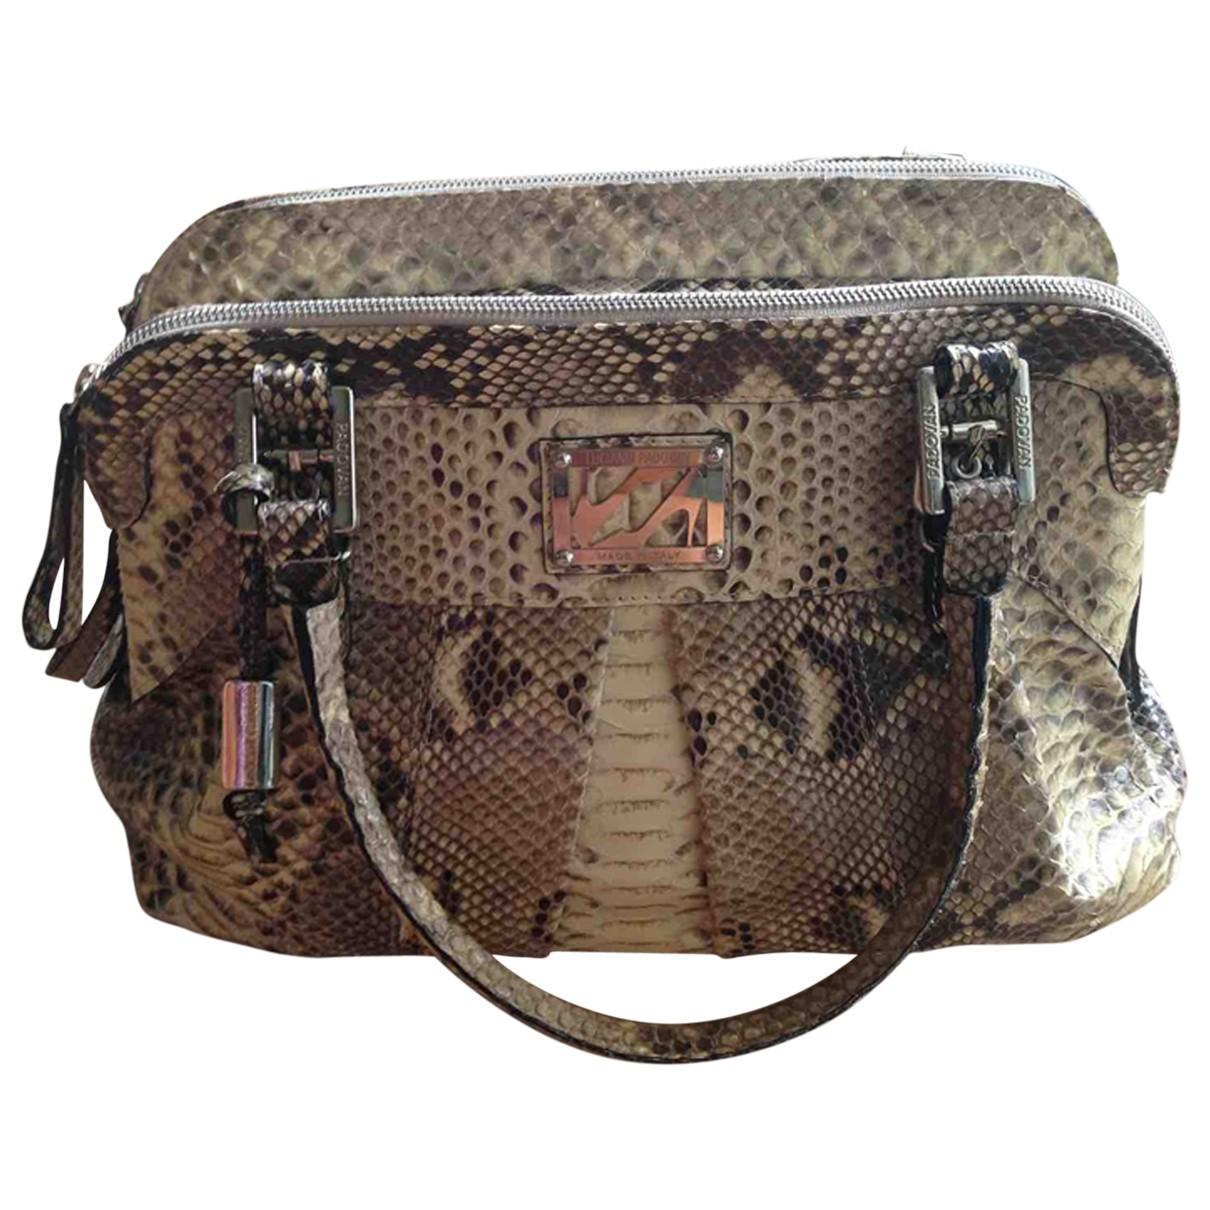 Luciano Padovan \N Beige Python handbag for Women \N